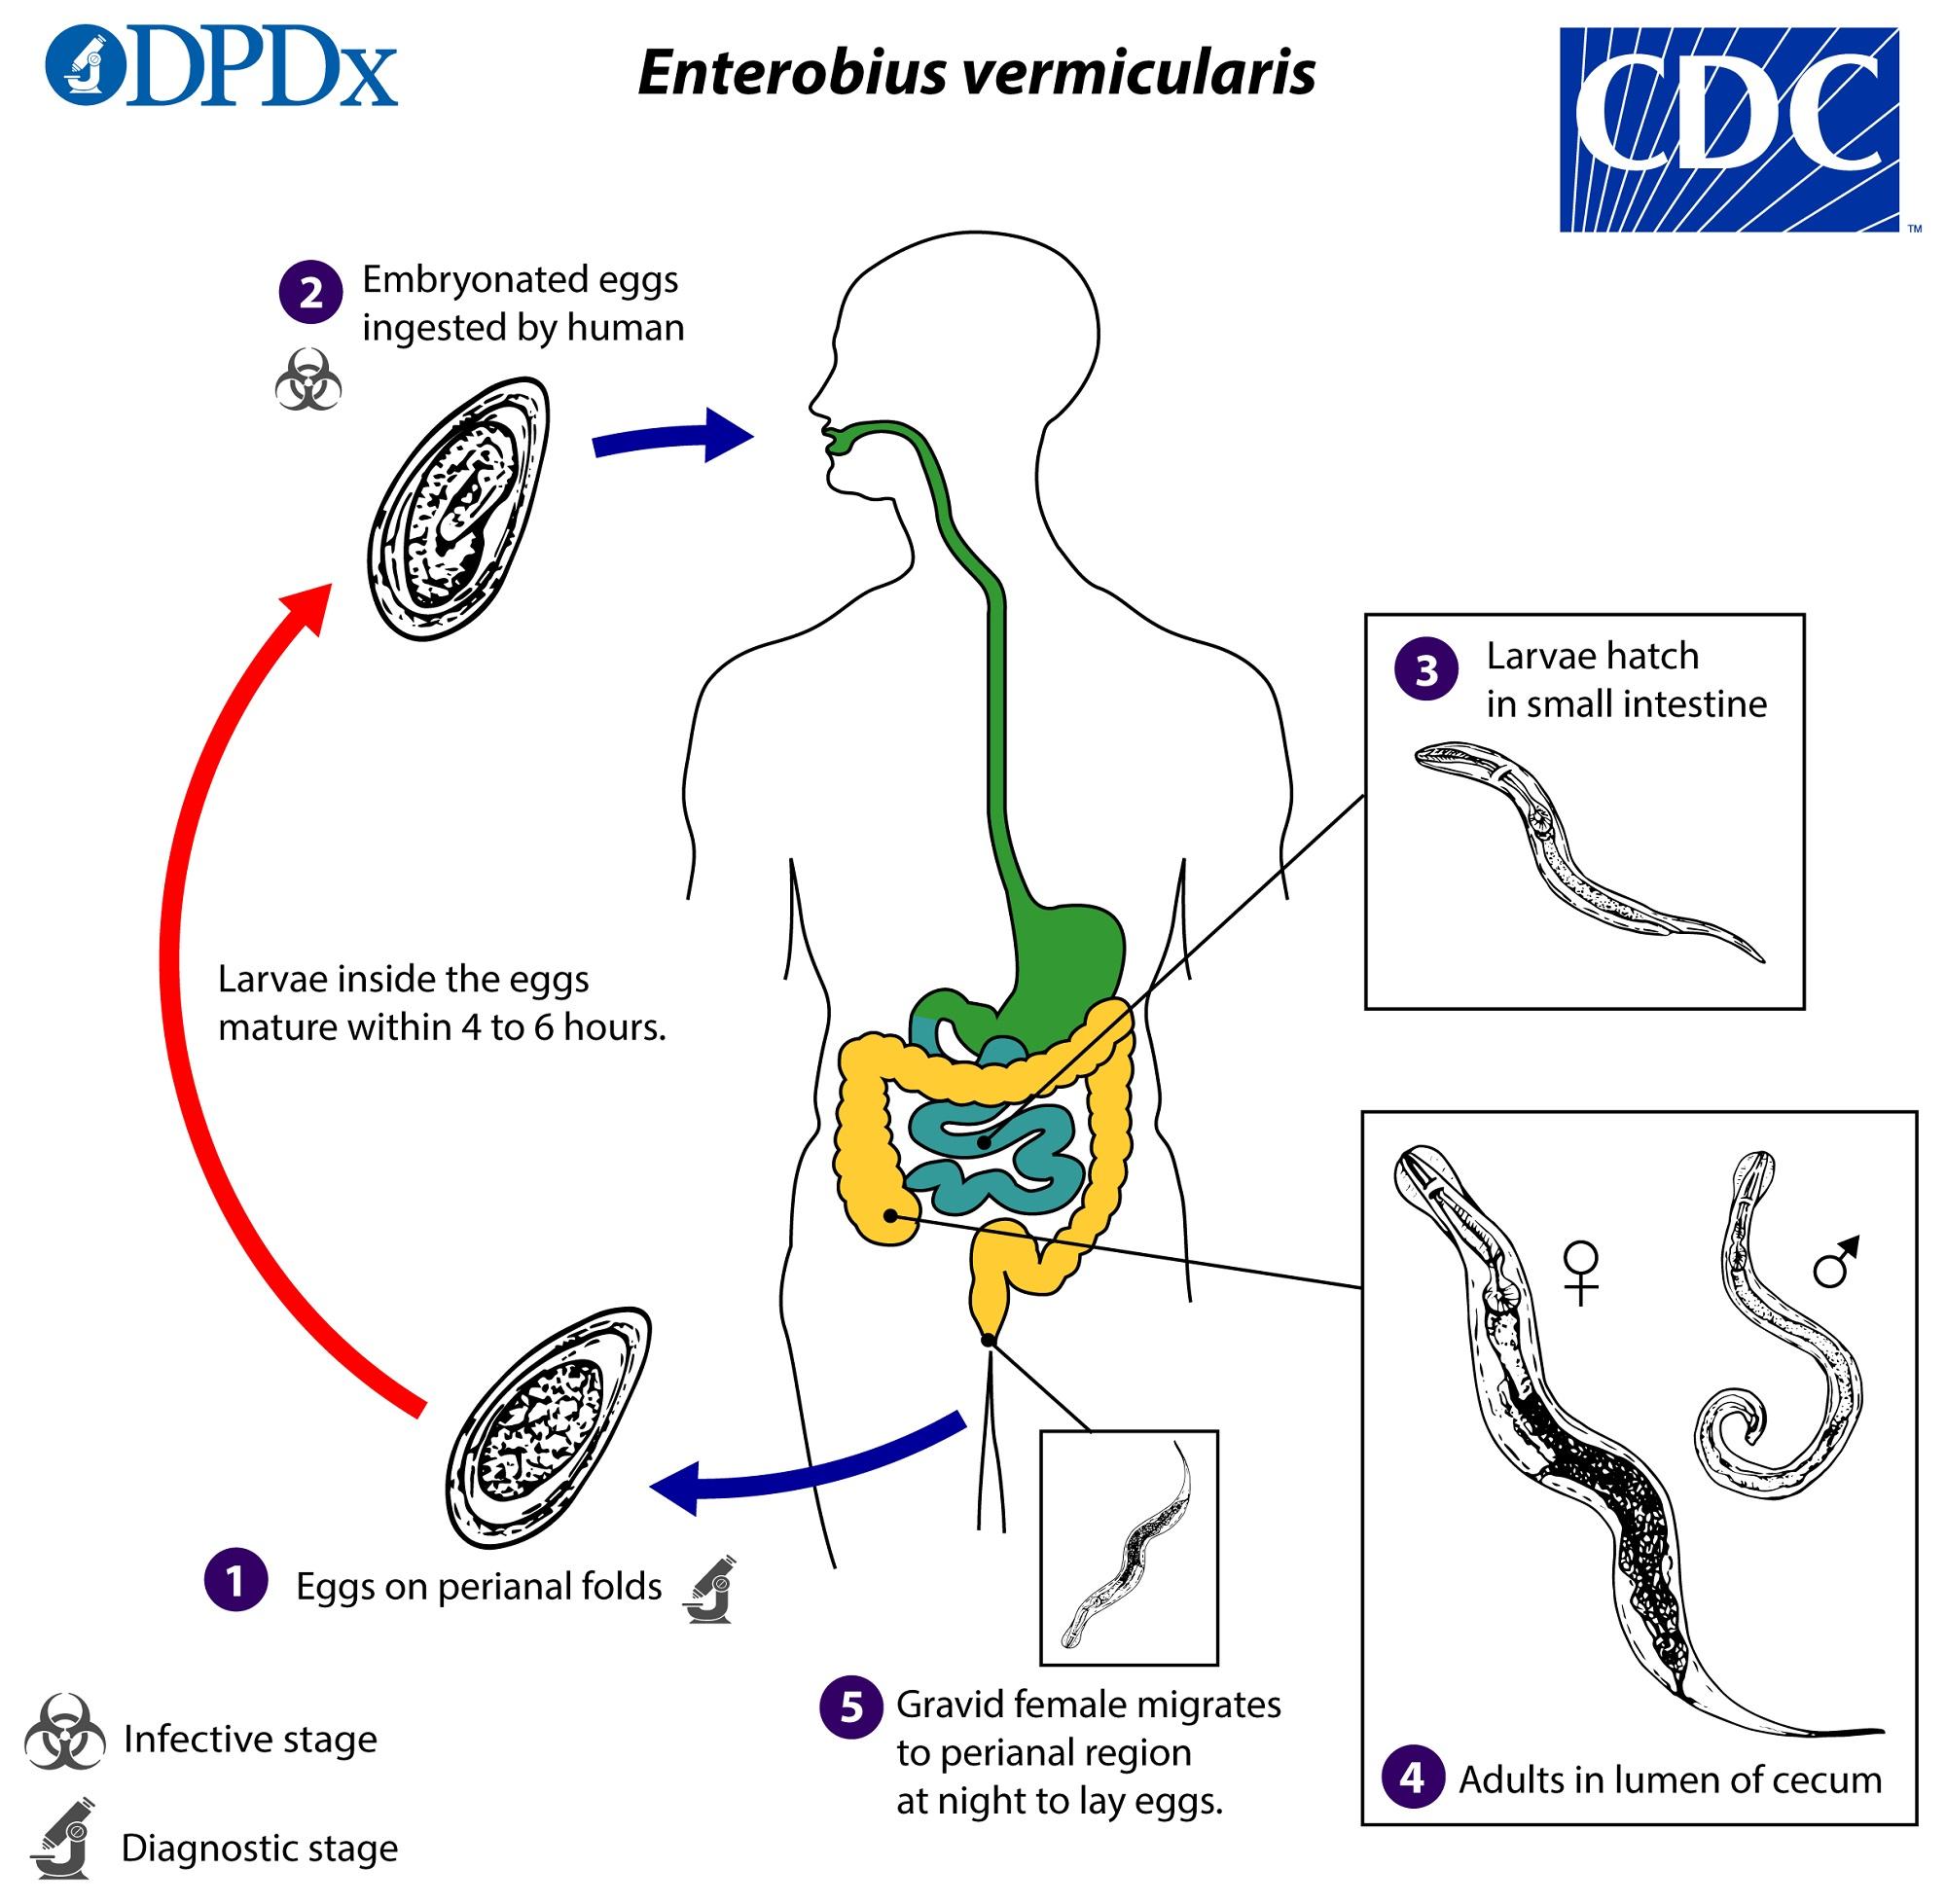 Enterobius vermicularis (Gombféreg)